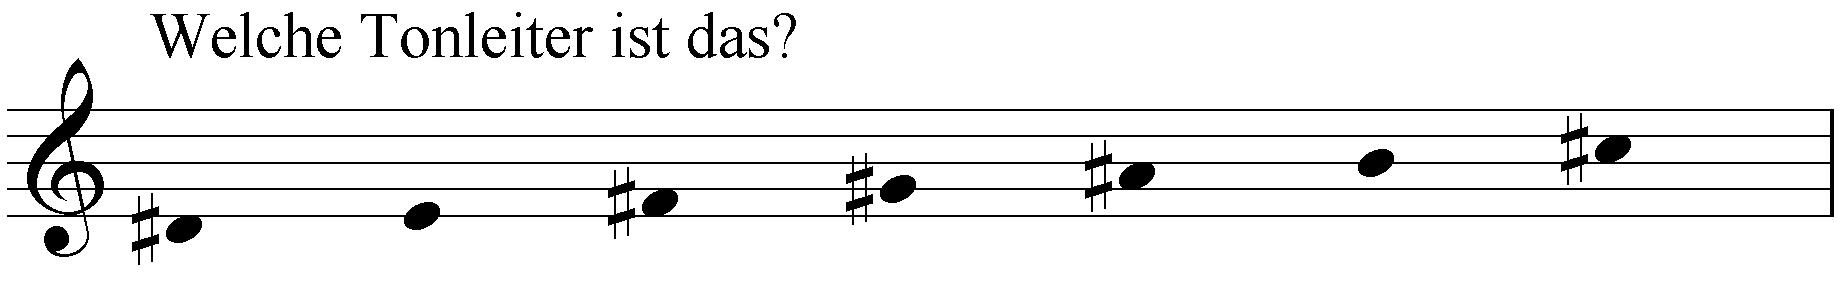 Welche Tonleiter ist das: dis e fis gis ais h cis?